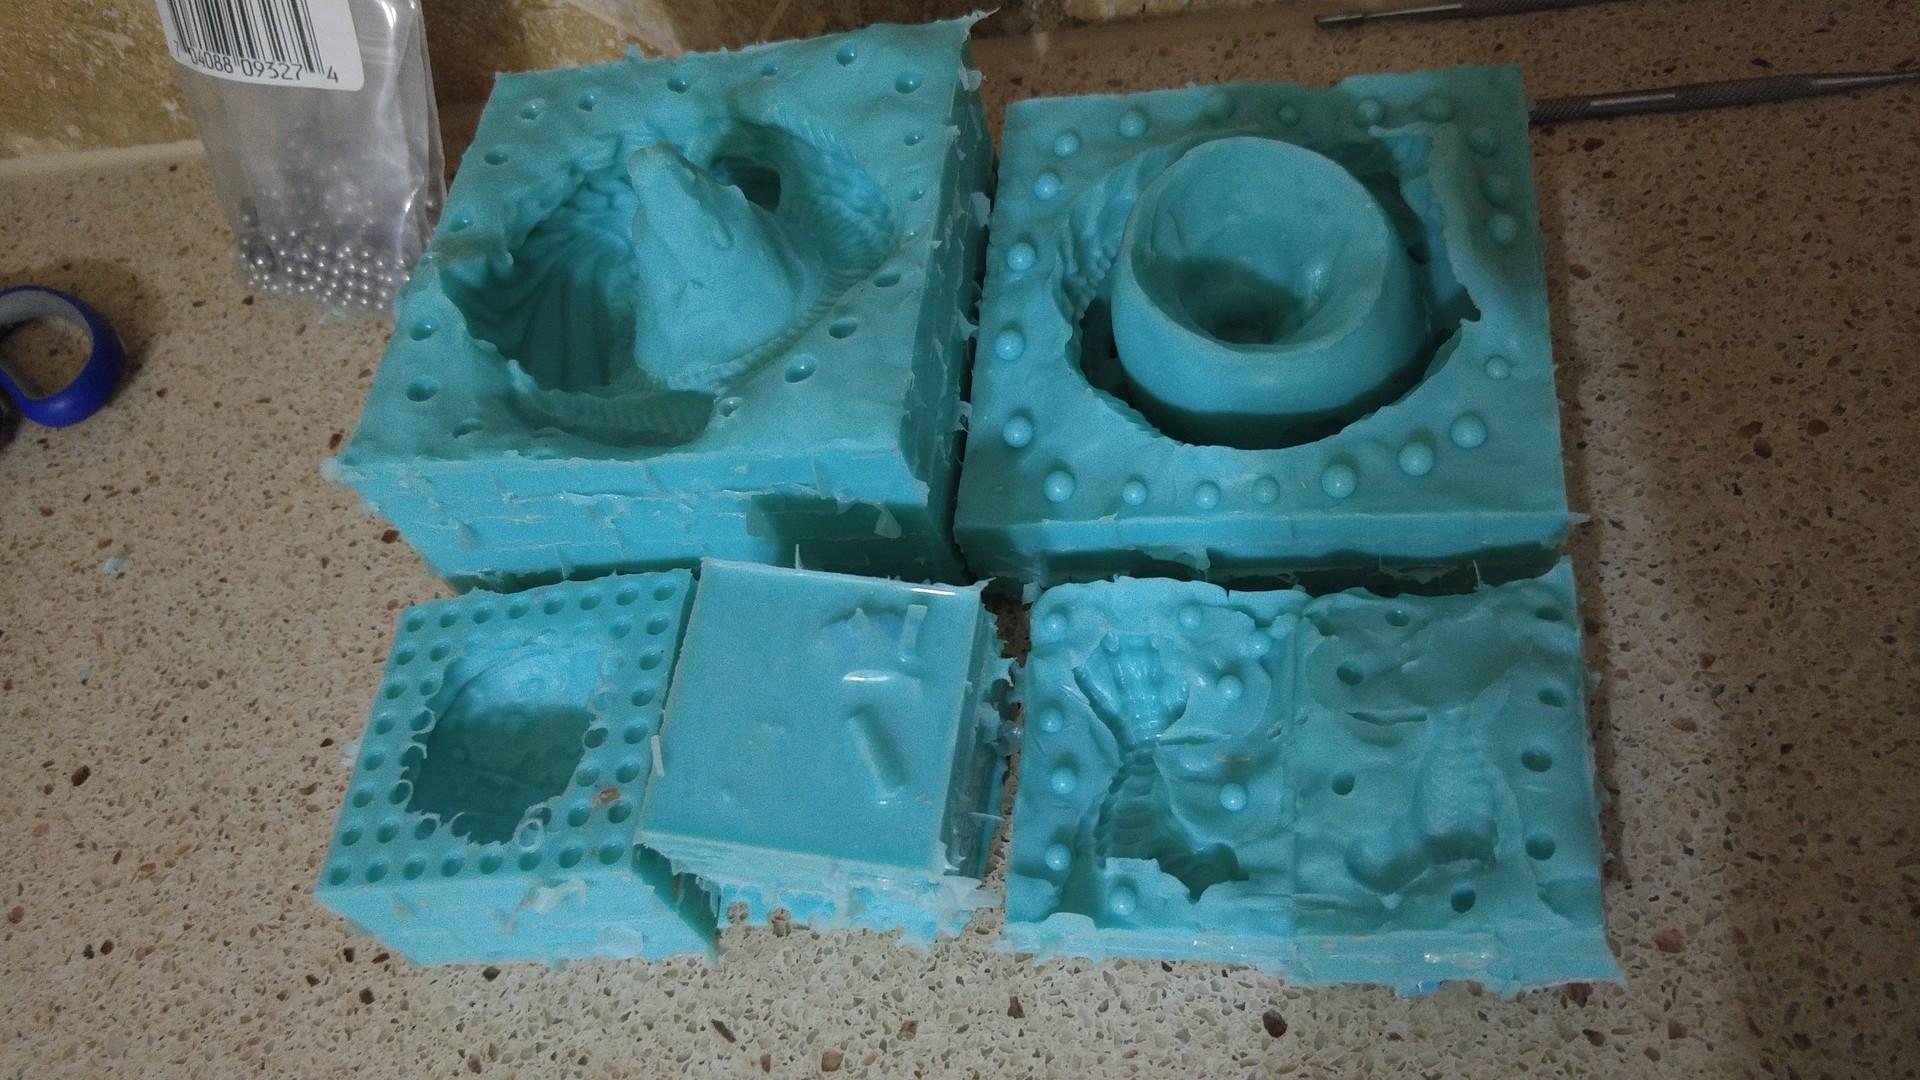 Molds I created